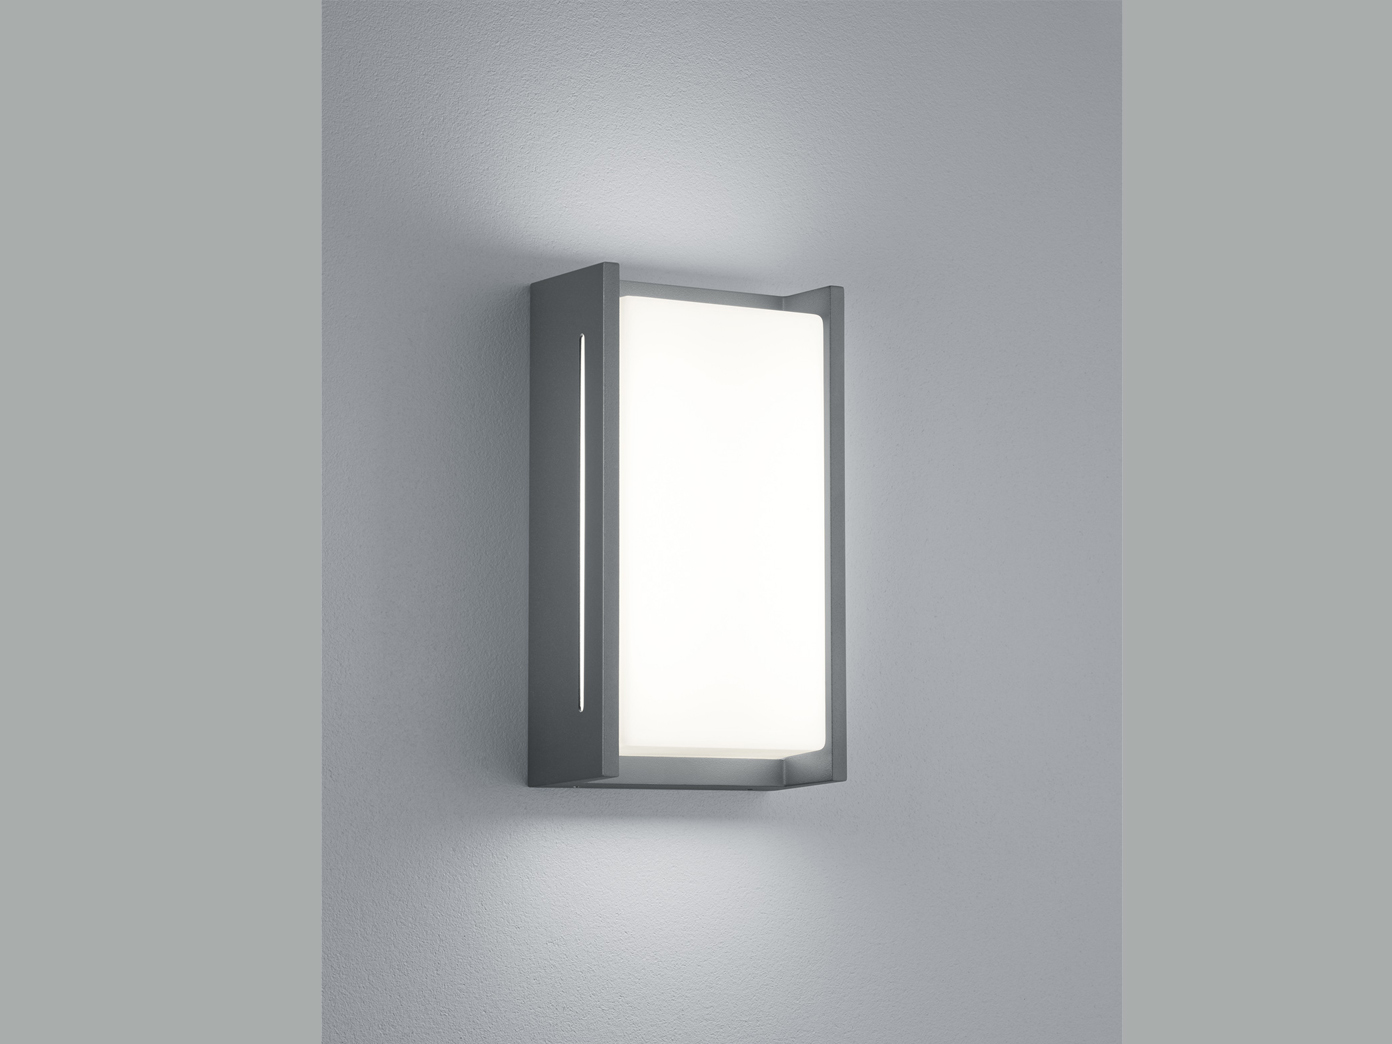 Acrylglas & aluminiumguss led außenwandleuchte indus in in in